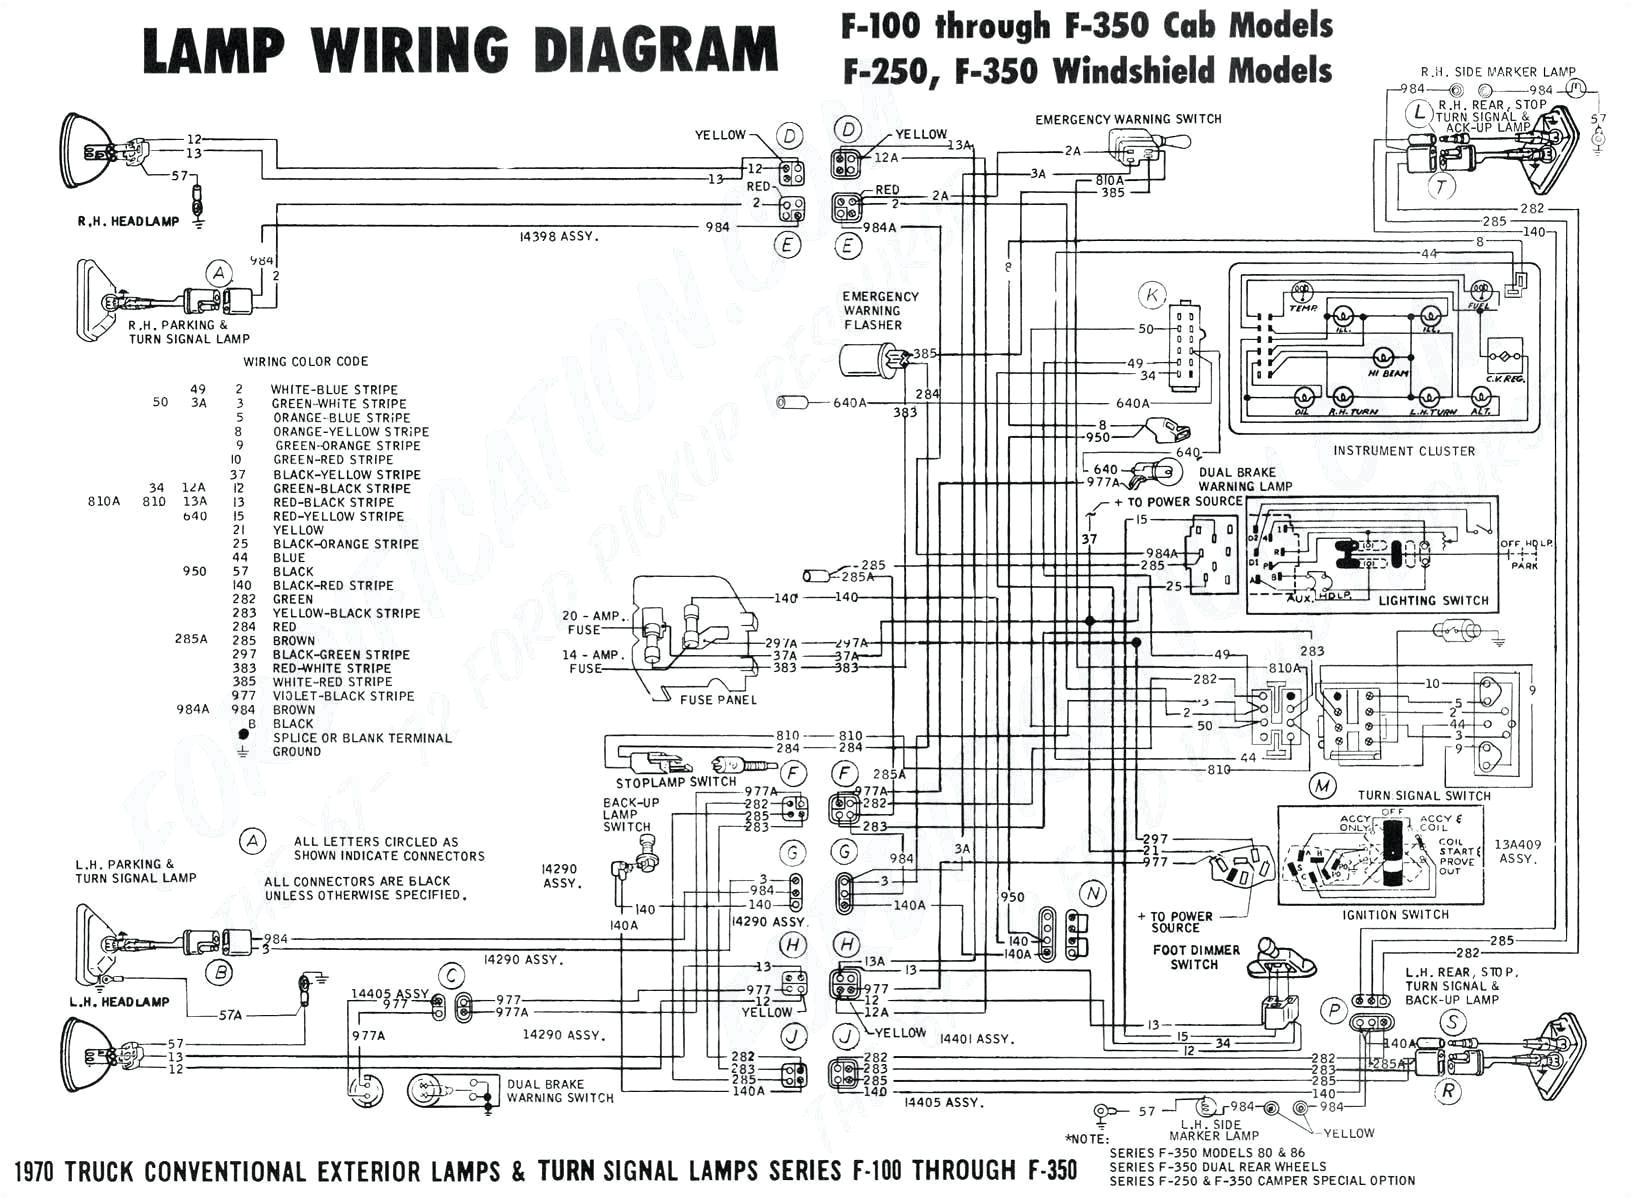 2010 fatboy wiring diagram wiring diagram technic wiring diagram free download fireman